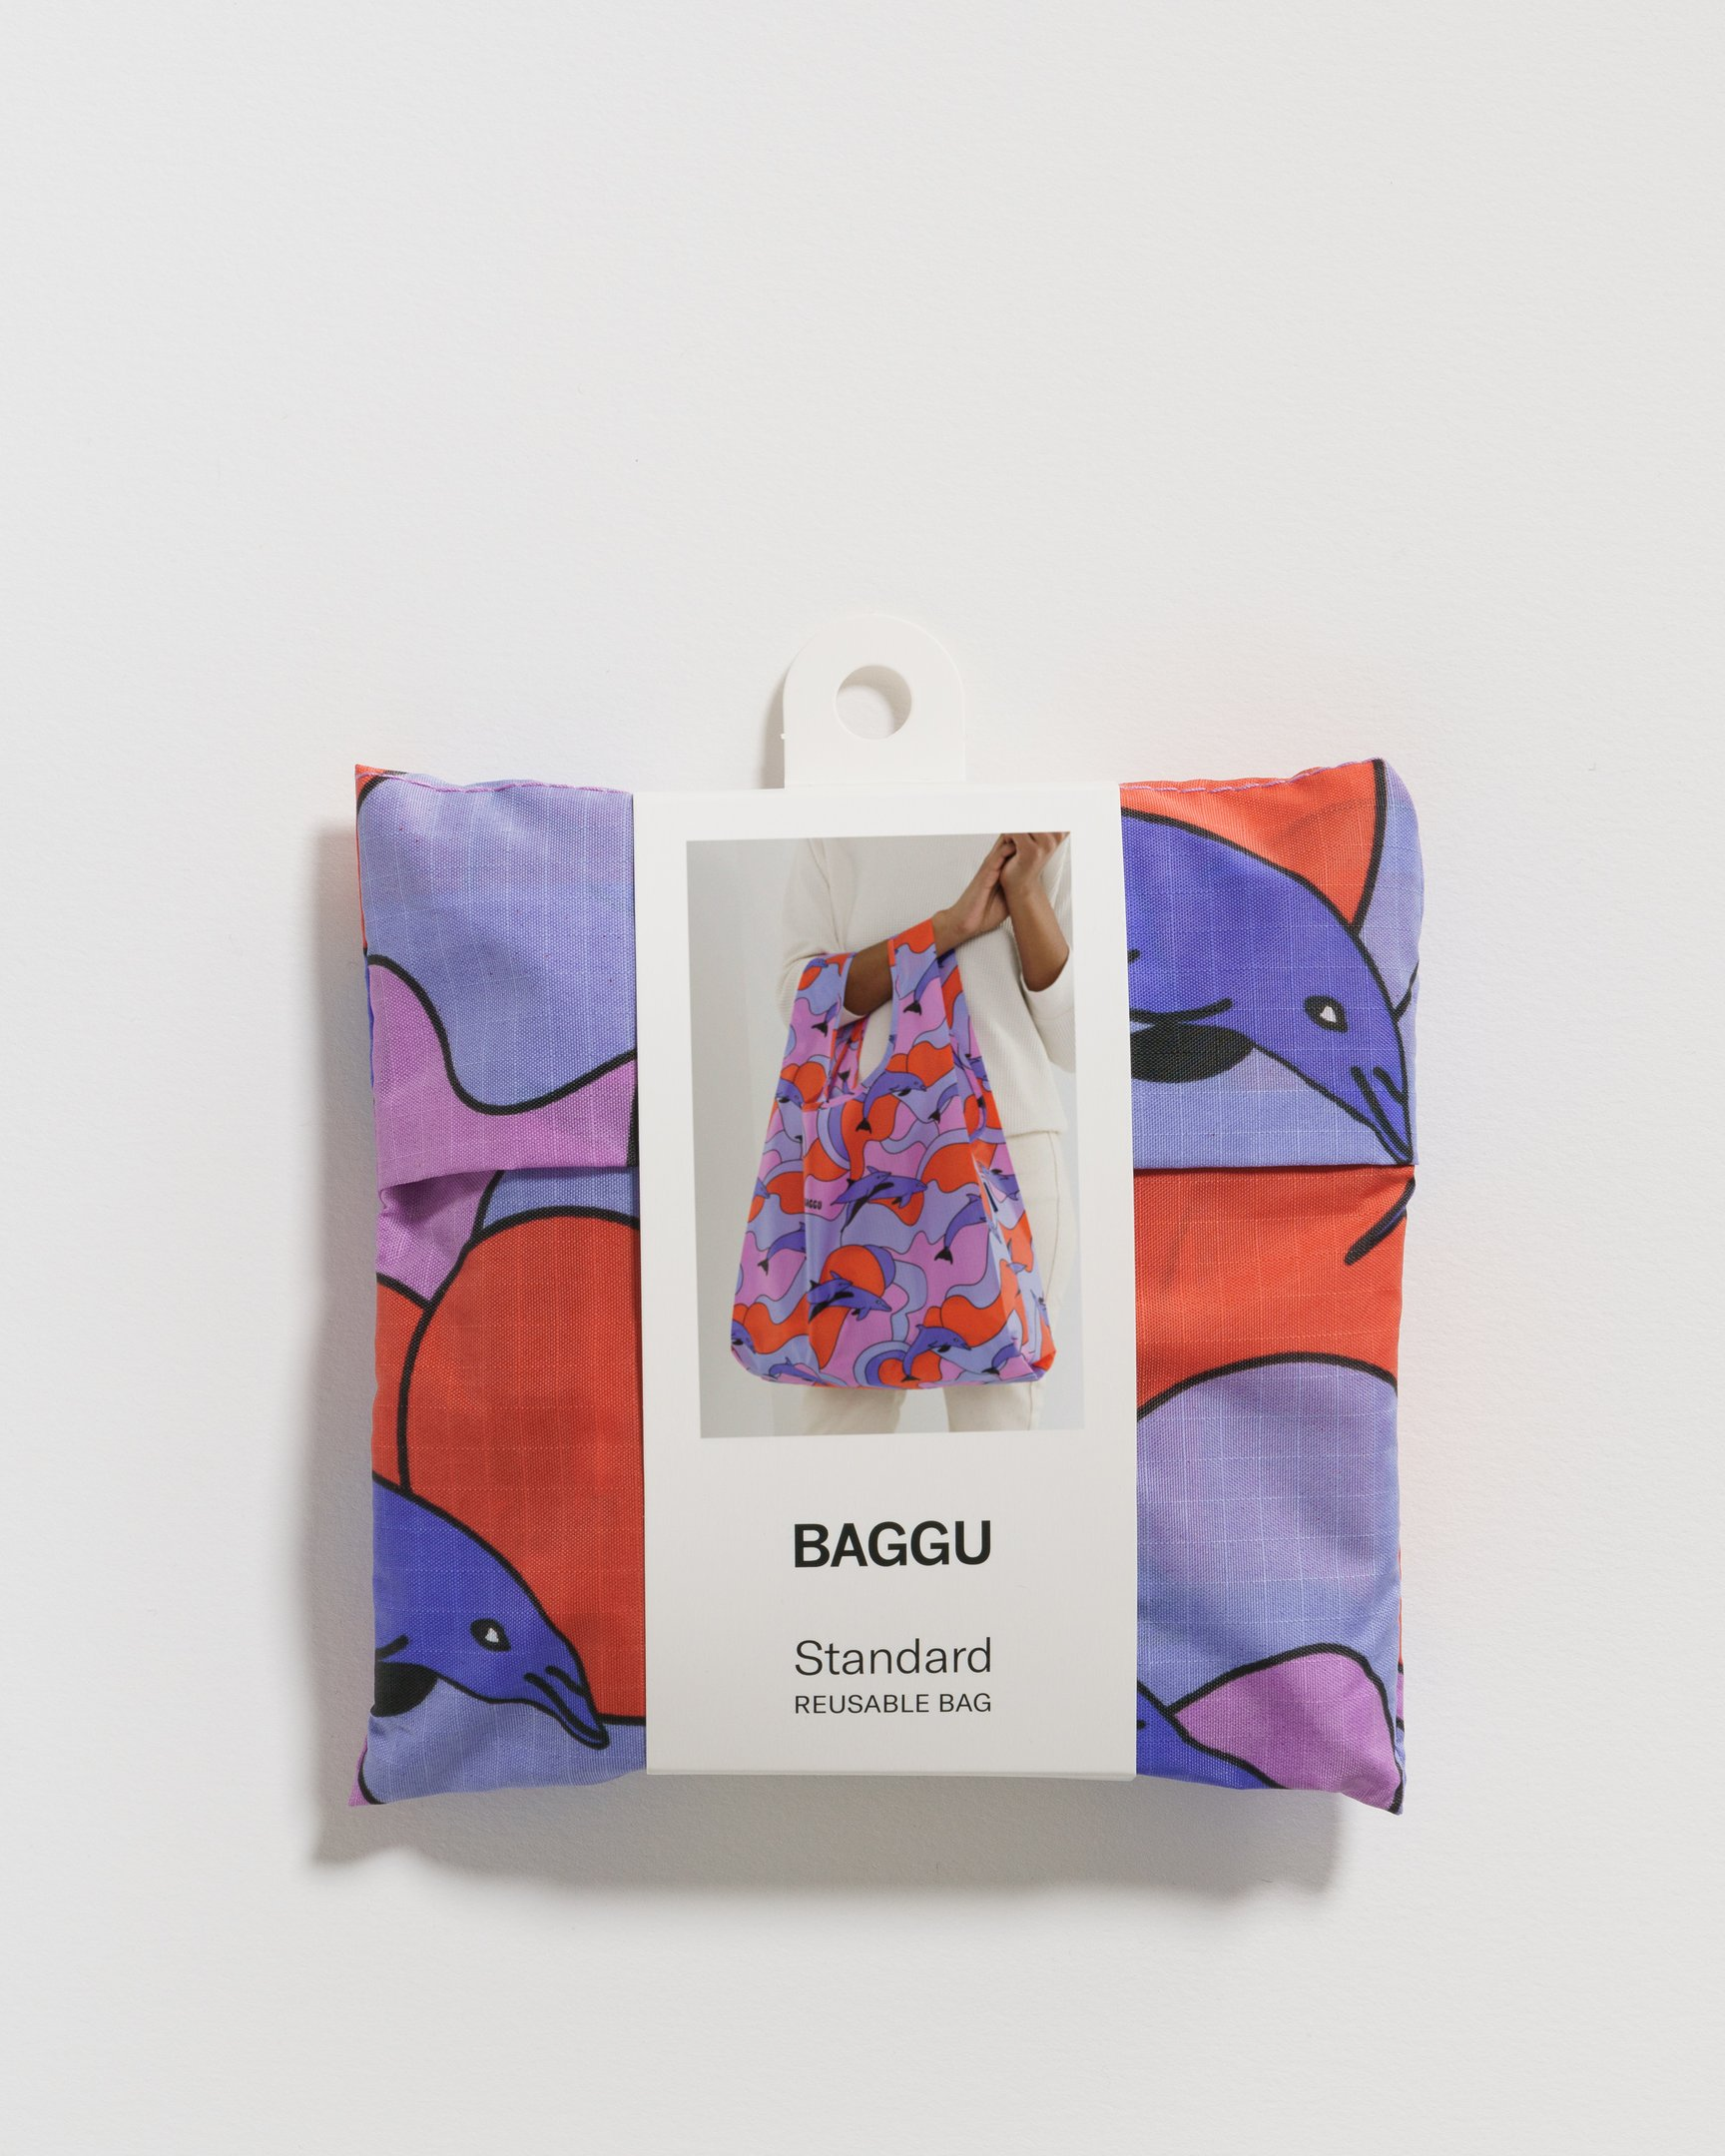 BAGGU Einkaufsbeutel Delfine